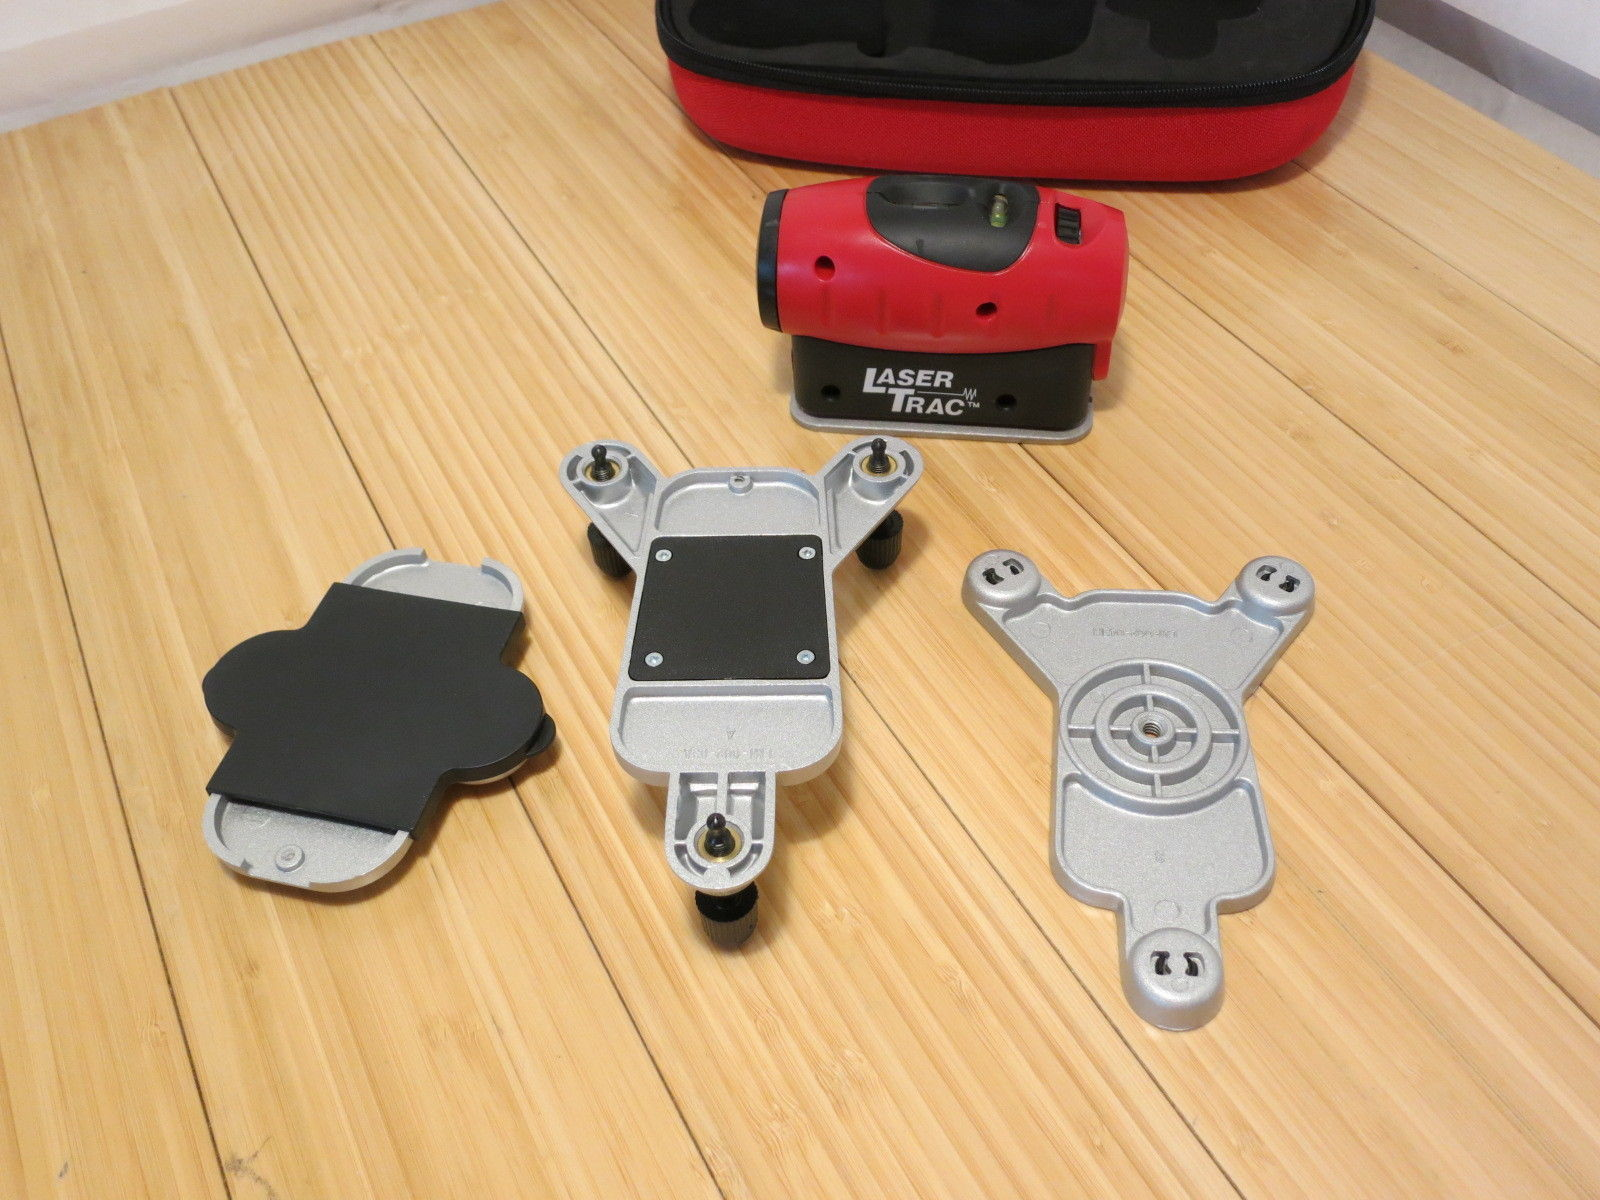 Urceri Laser Entfernungsmesser : New craftsman 4 in 1 level with laser trac and 50 similar items